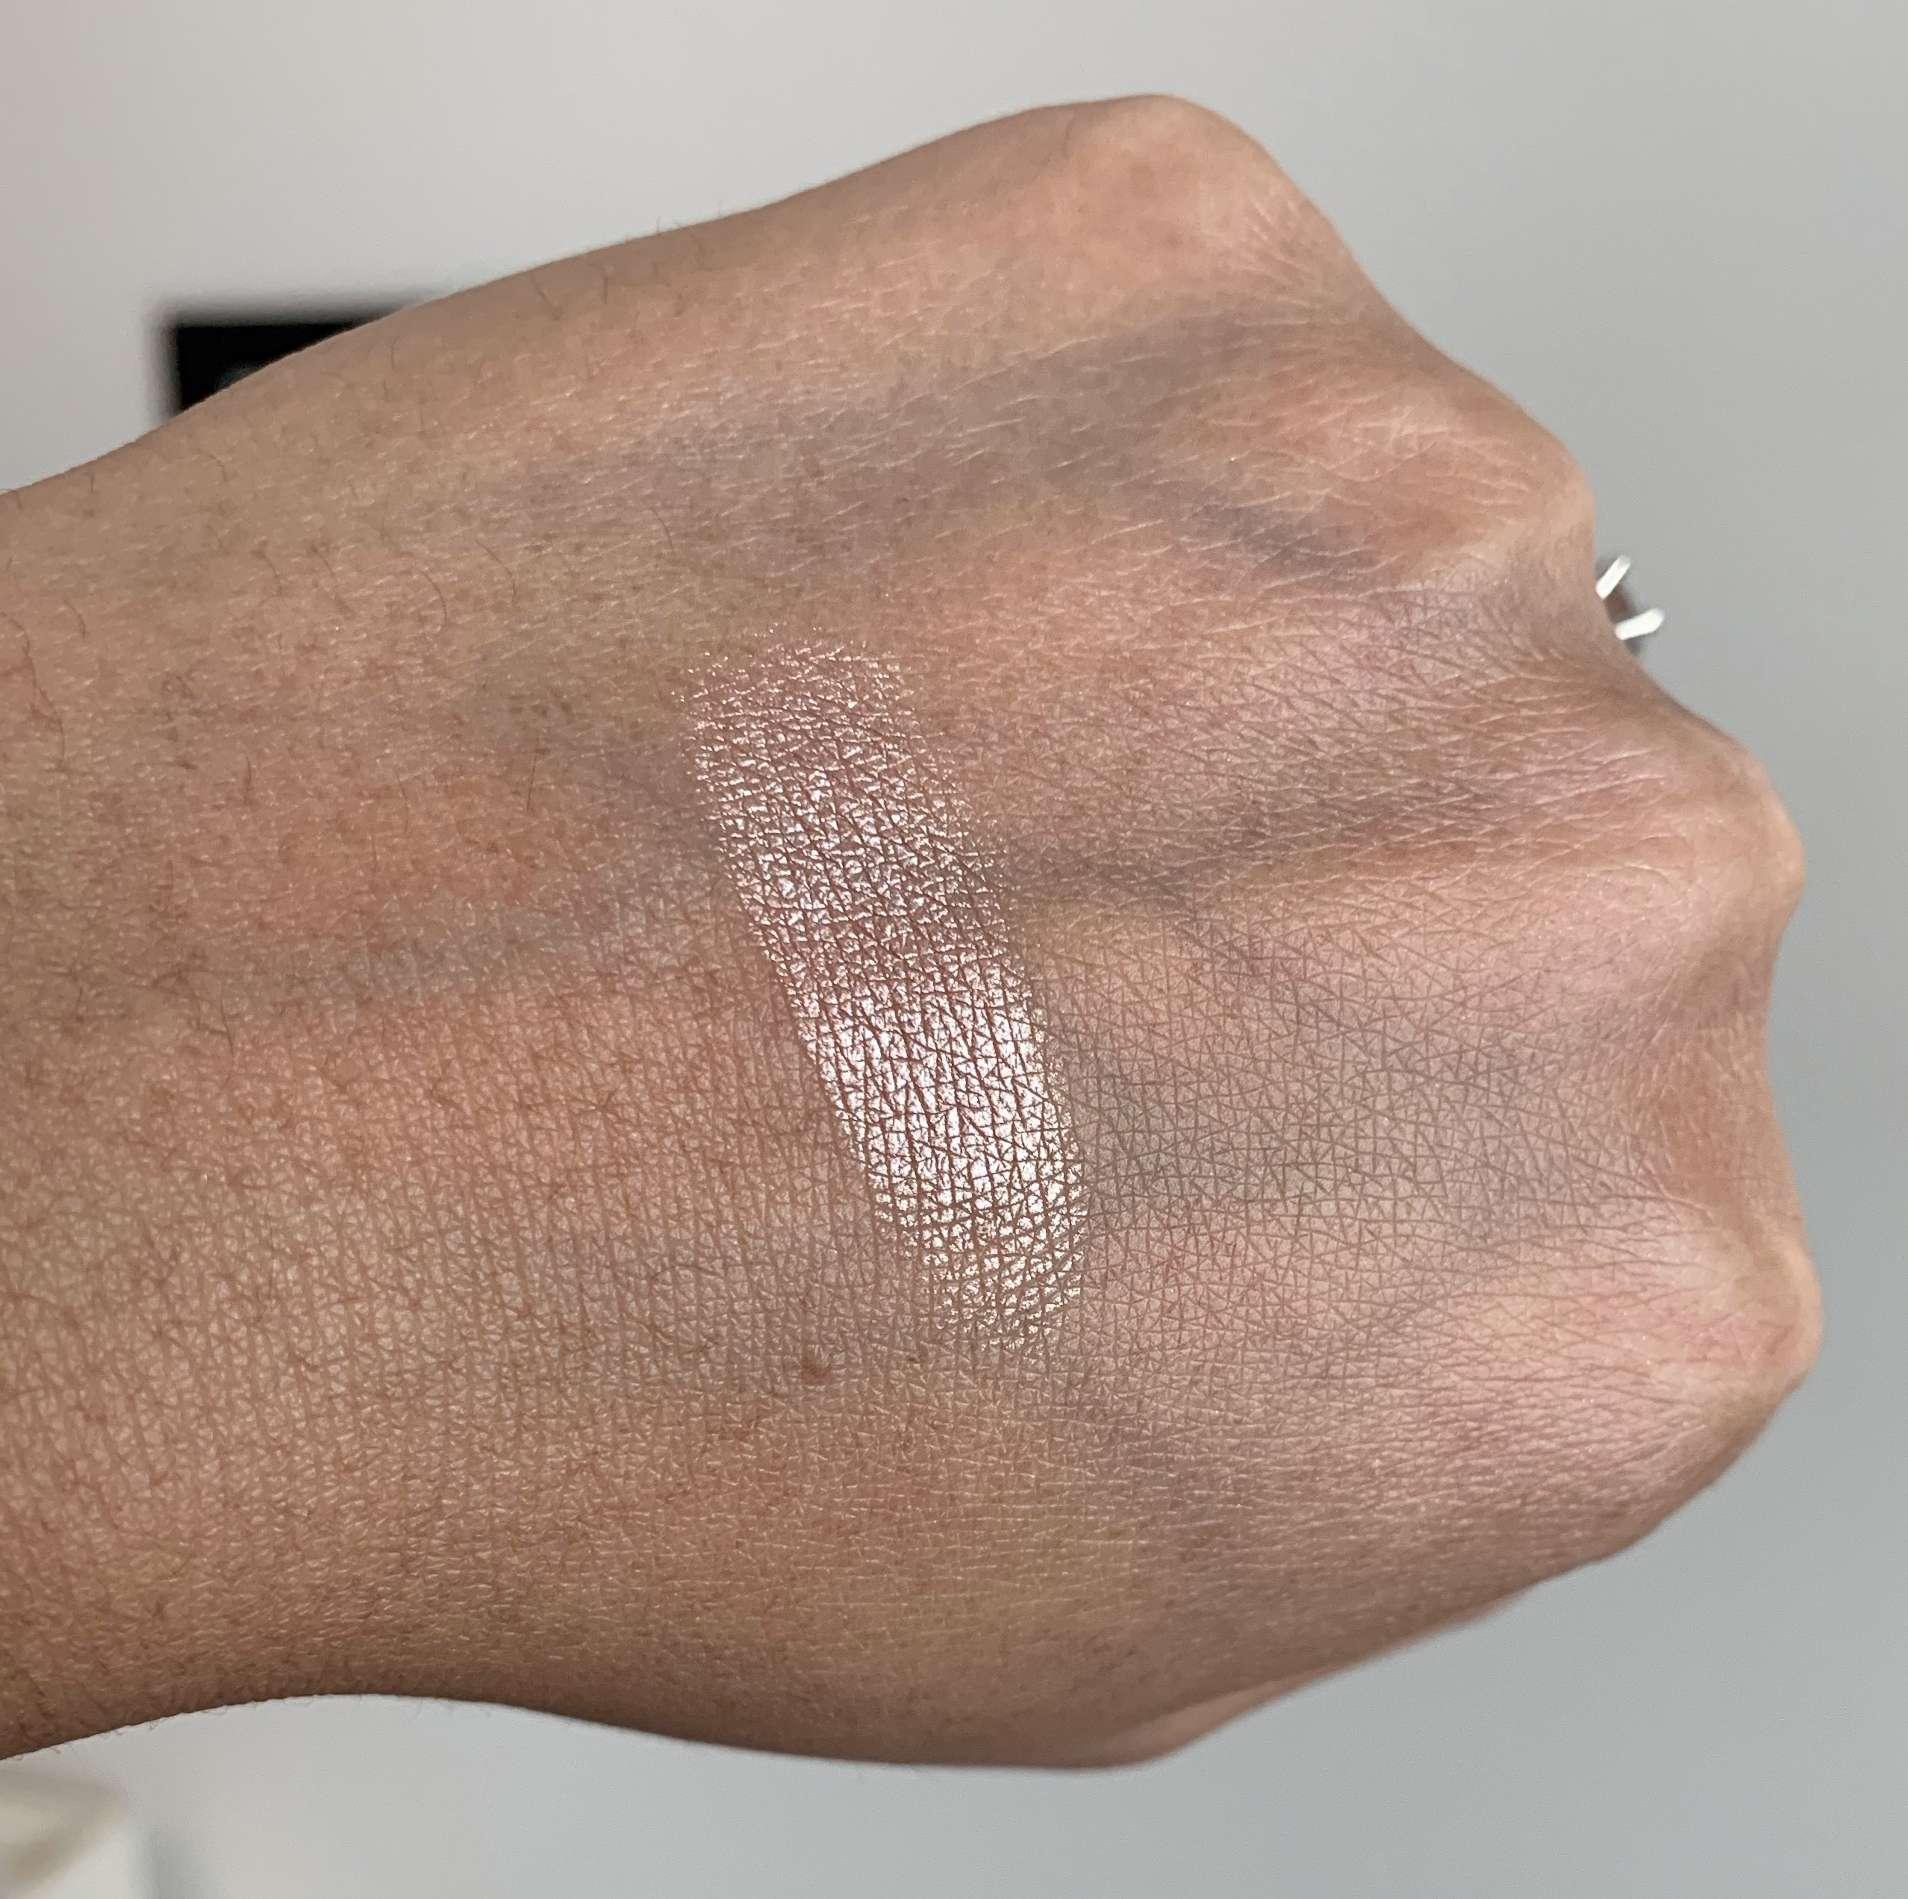 MAC Superb Extra Dimension Skinfinish Swatch on Medium Dark Skin